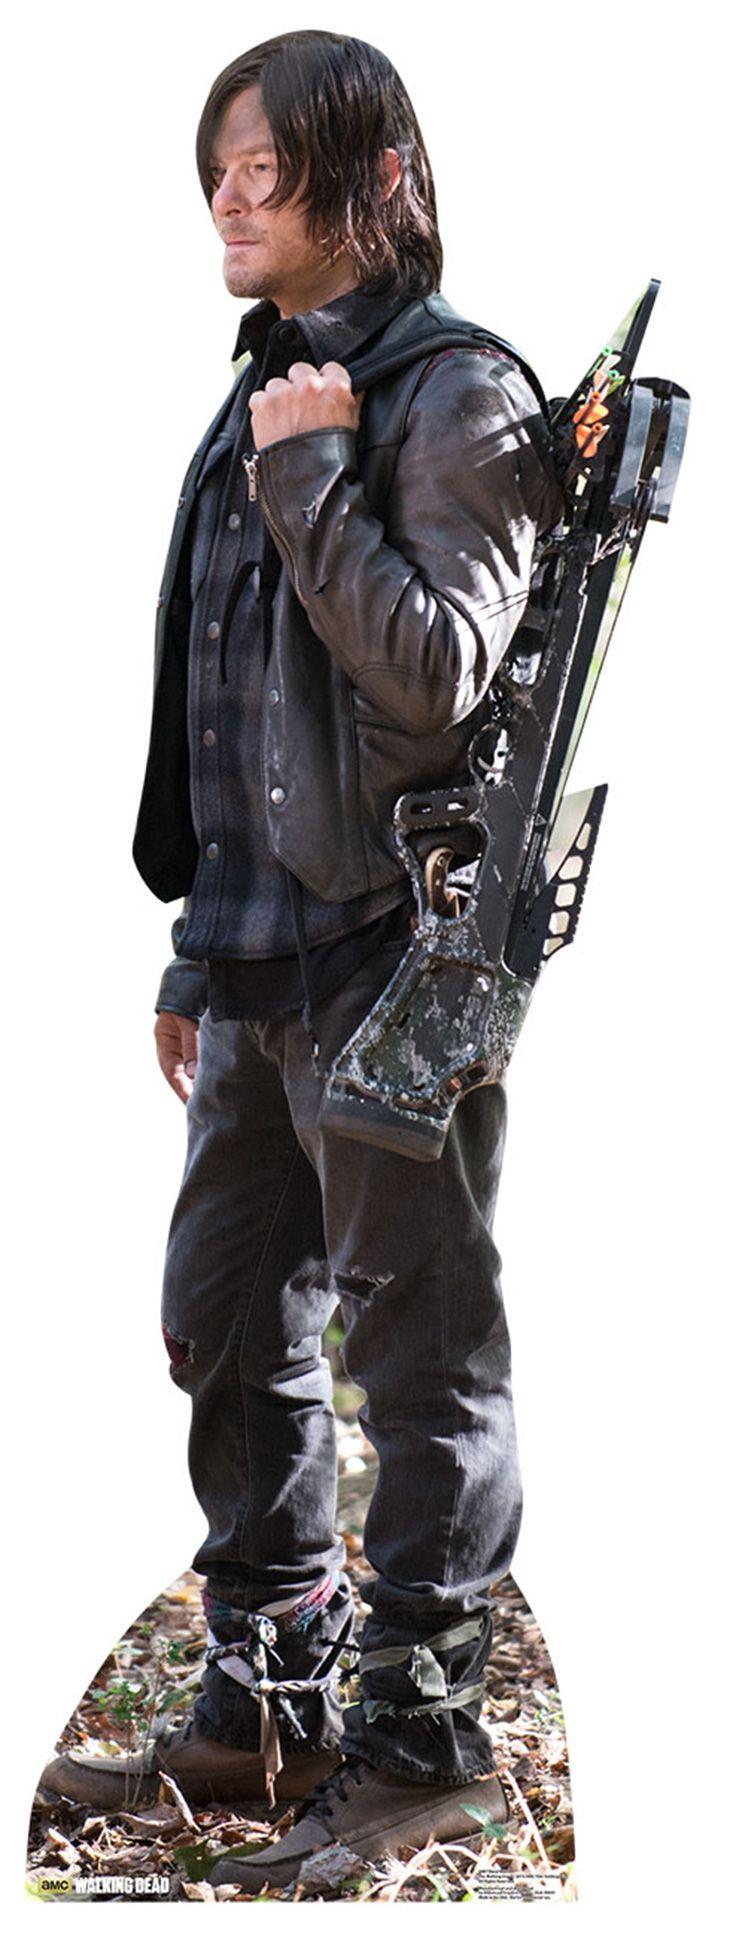 Mcfarlane walking dead series 6 daryl dixon action figure - Daryl Dixon The Walking Dead Cardboard Cutout Standup Standee